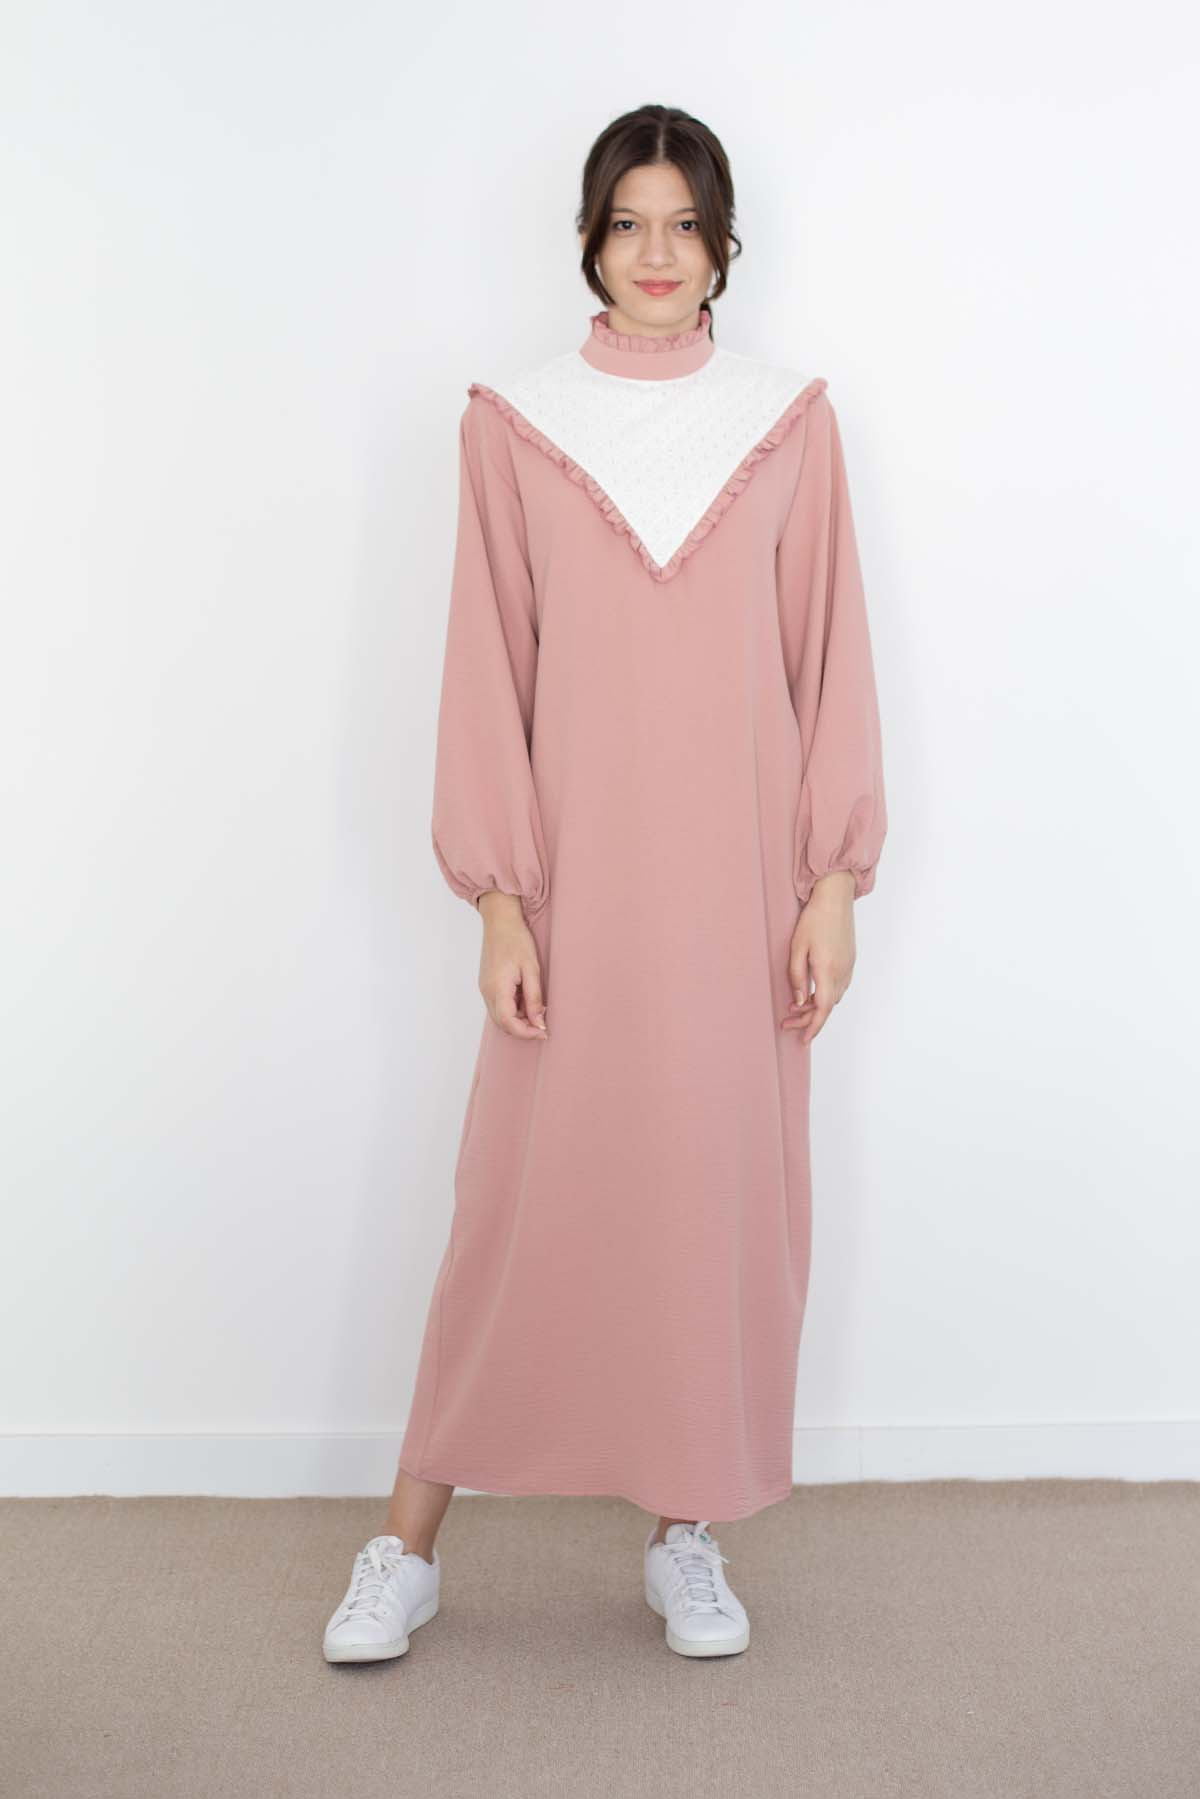 Mevra - Fırfırlı Elbise Pudra